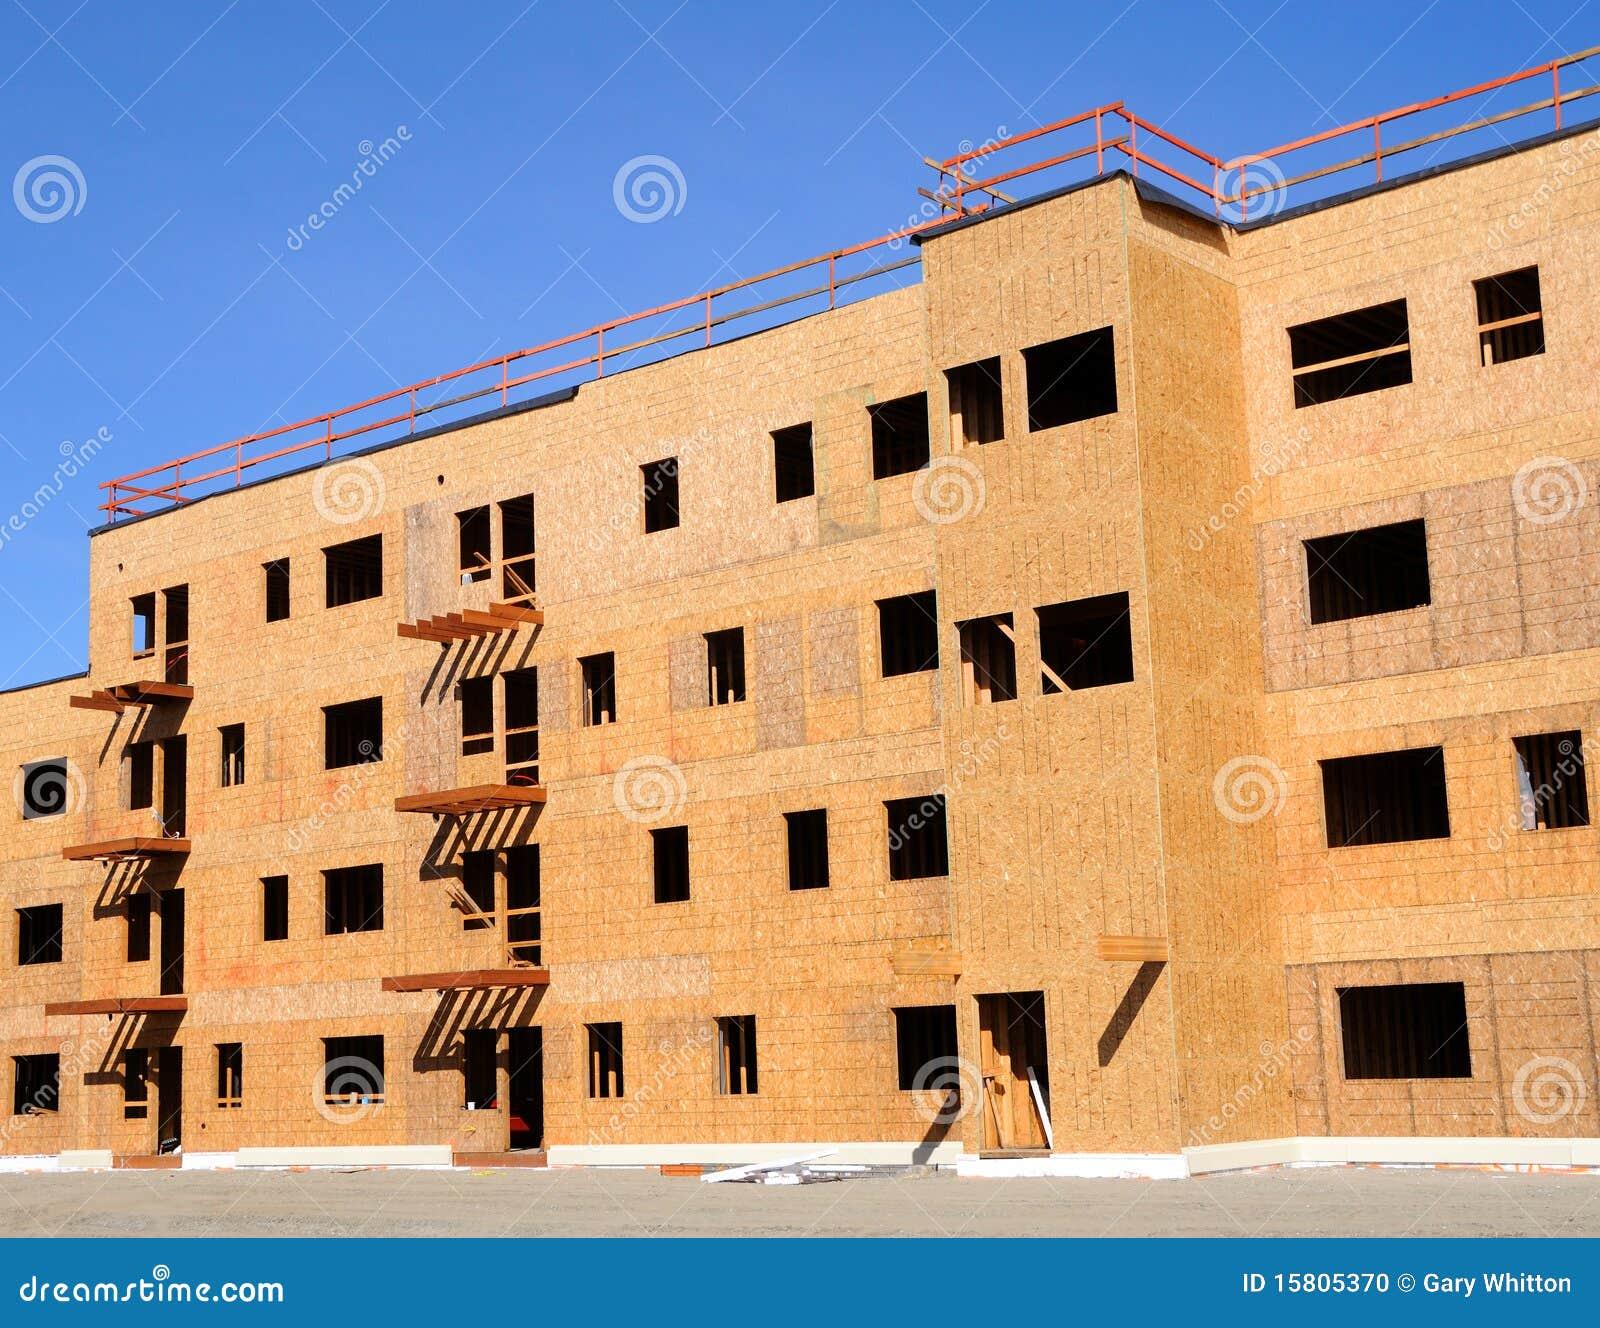 Senior Apartments: Senior Housing Apartments Stock Photo. Image Of Units